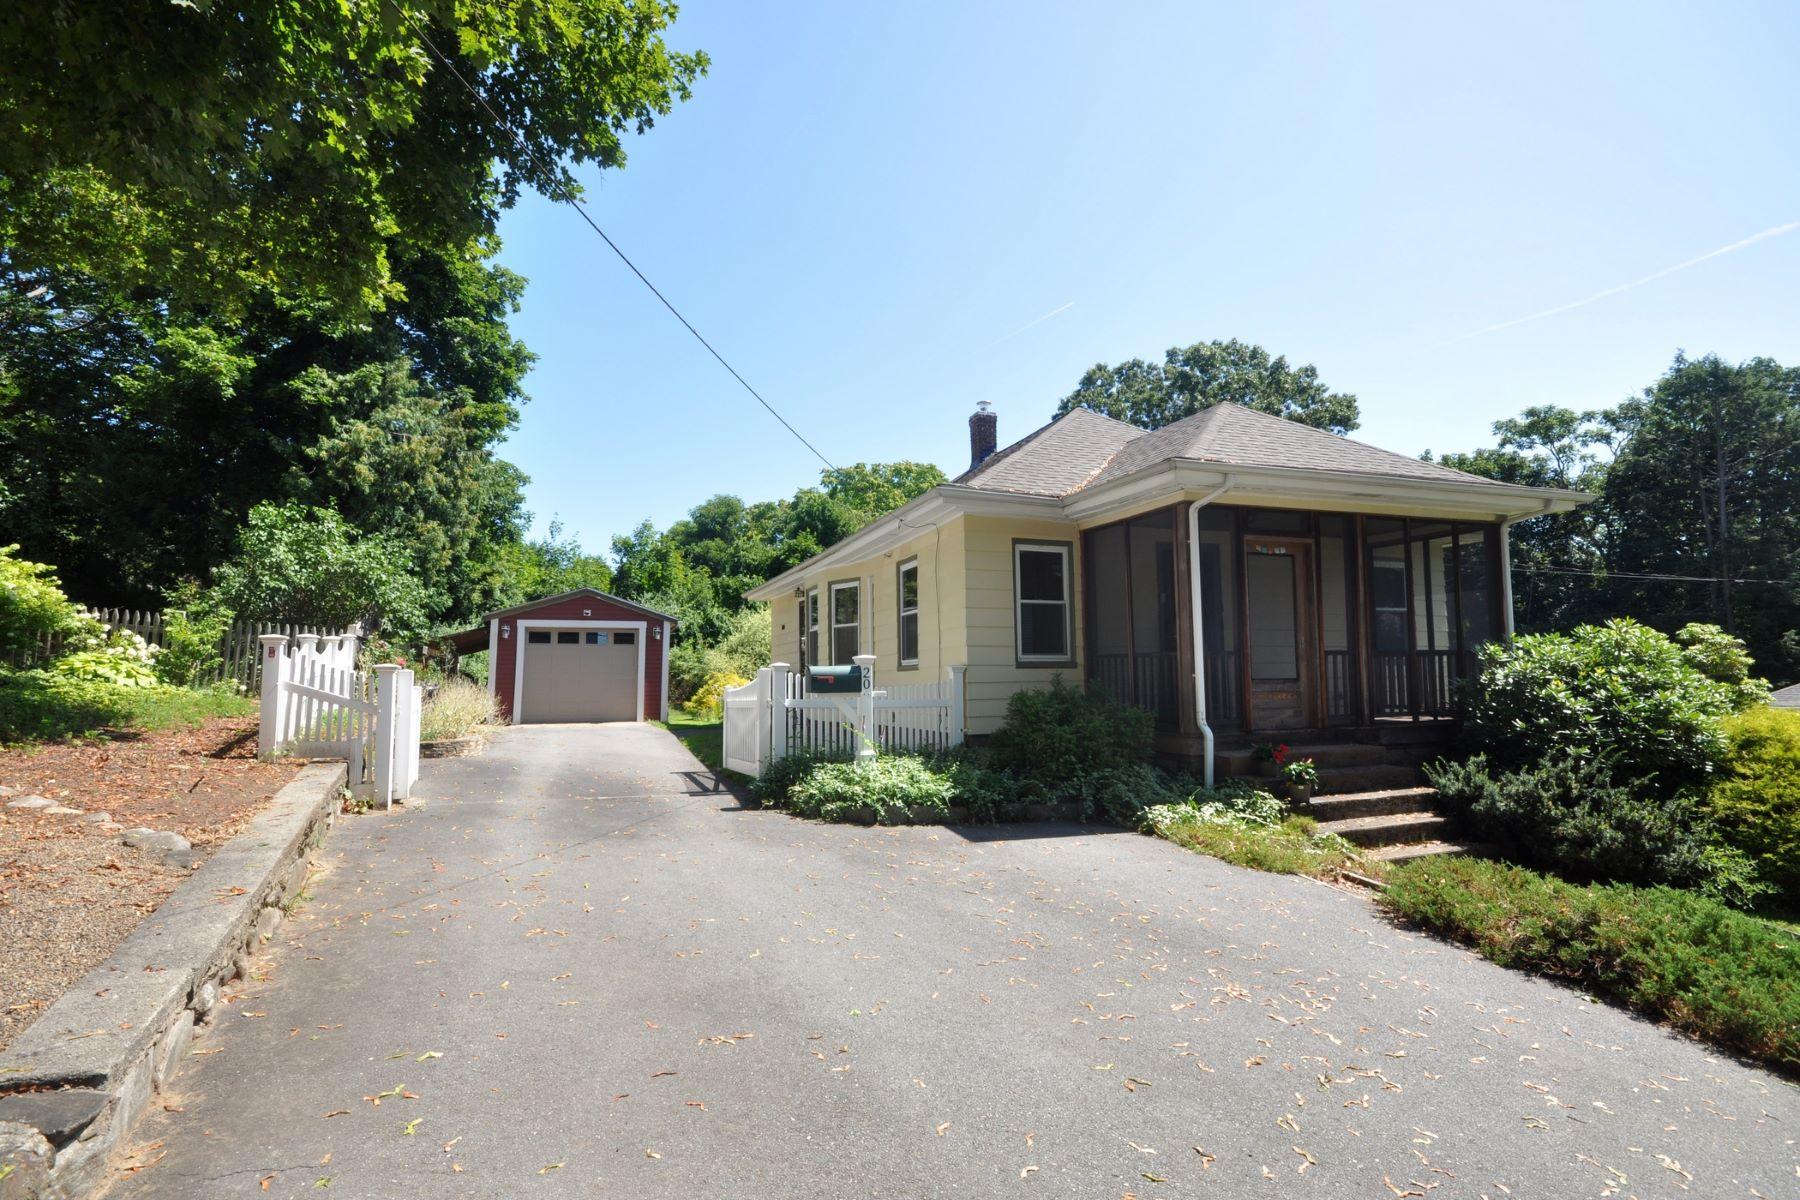 Single Family Homes for Sale at 20 Lewis St Maynard, Massachusetts 01754 United States